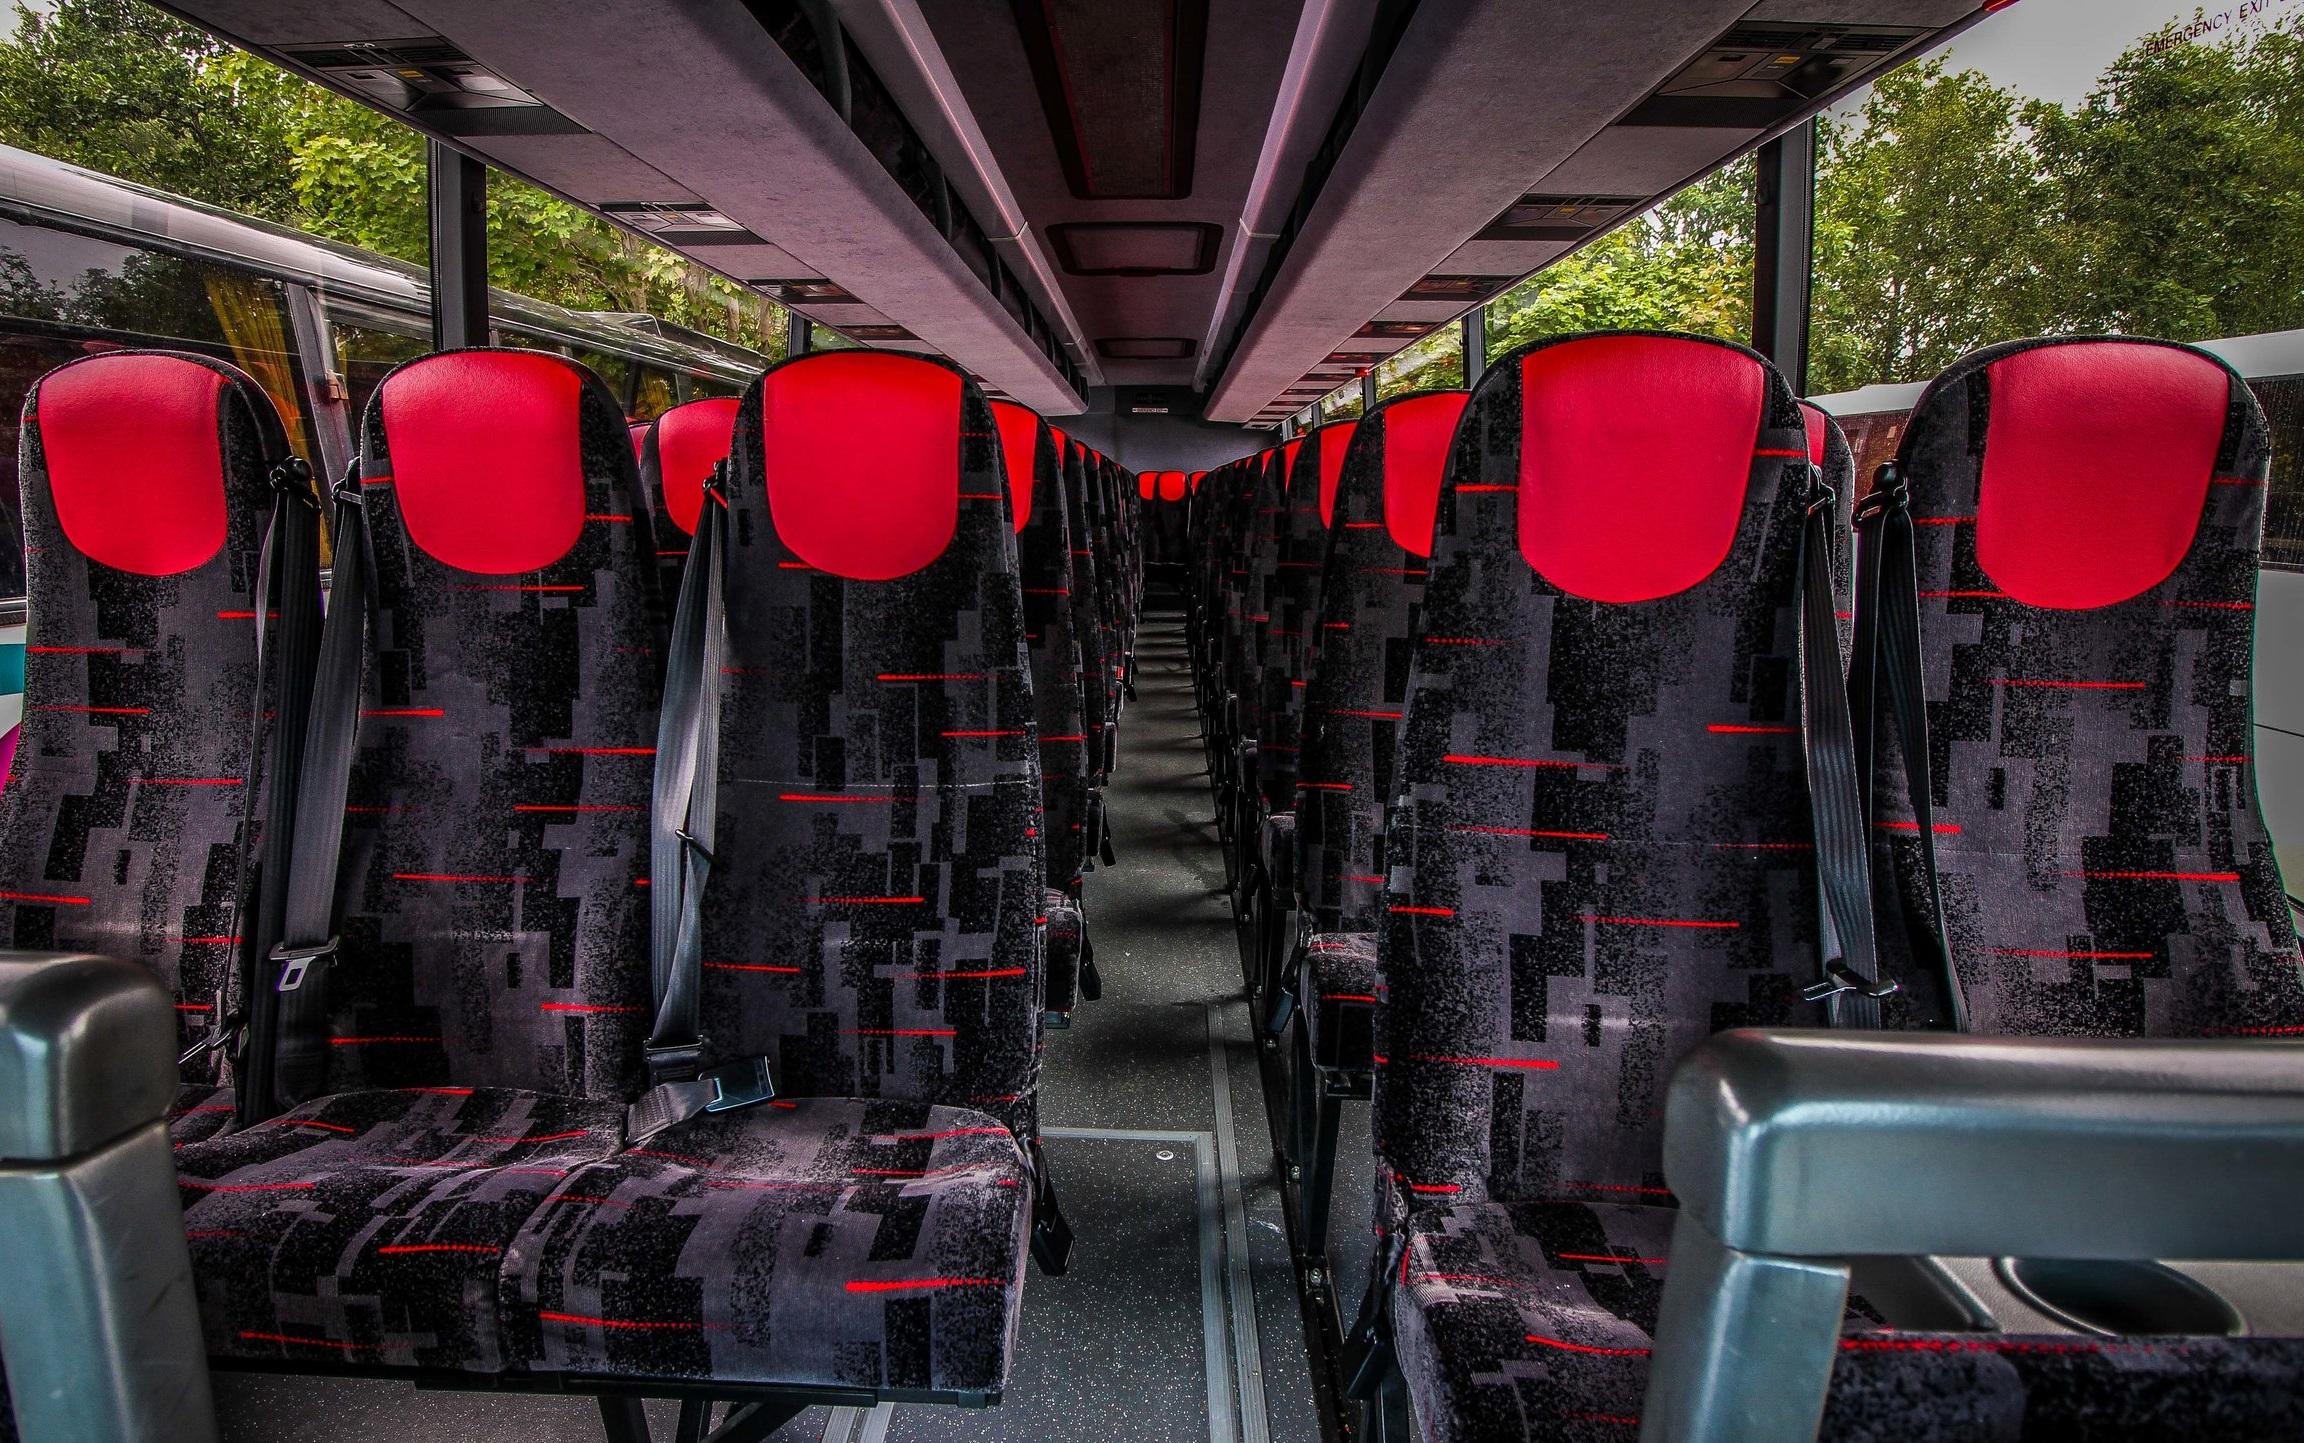 70 seat Vanhool T915 Coach